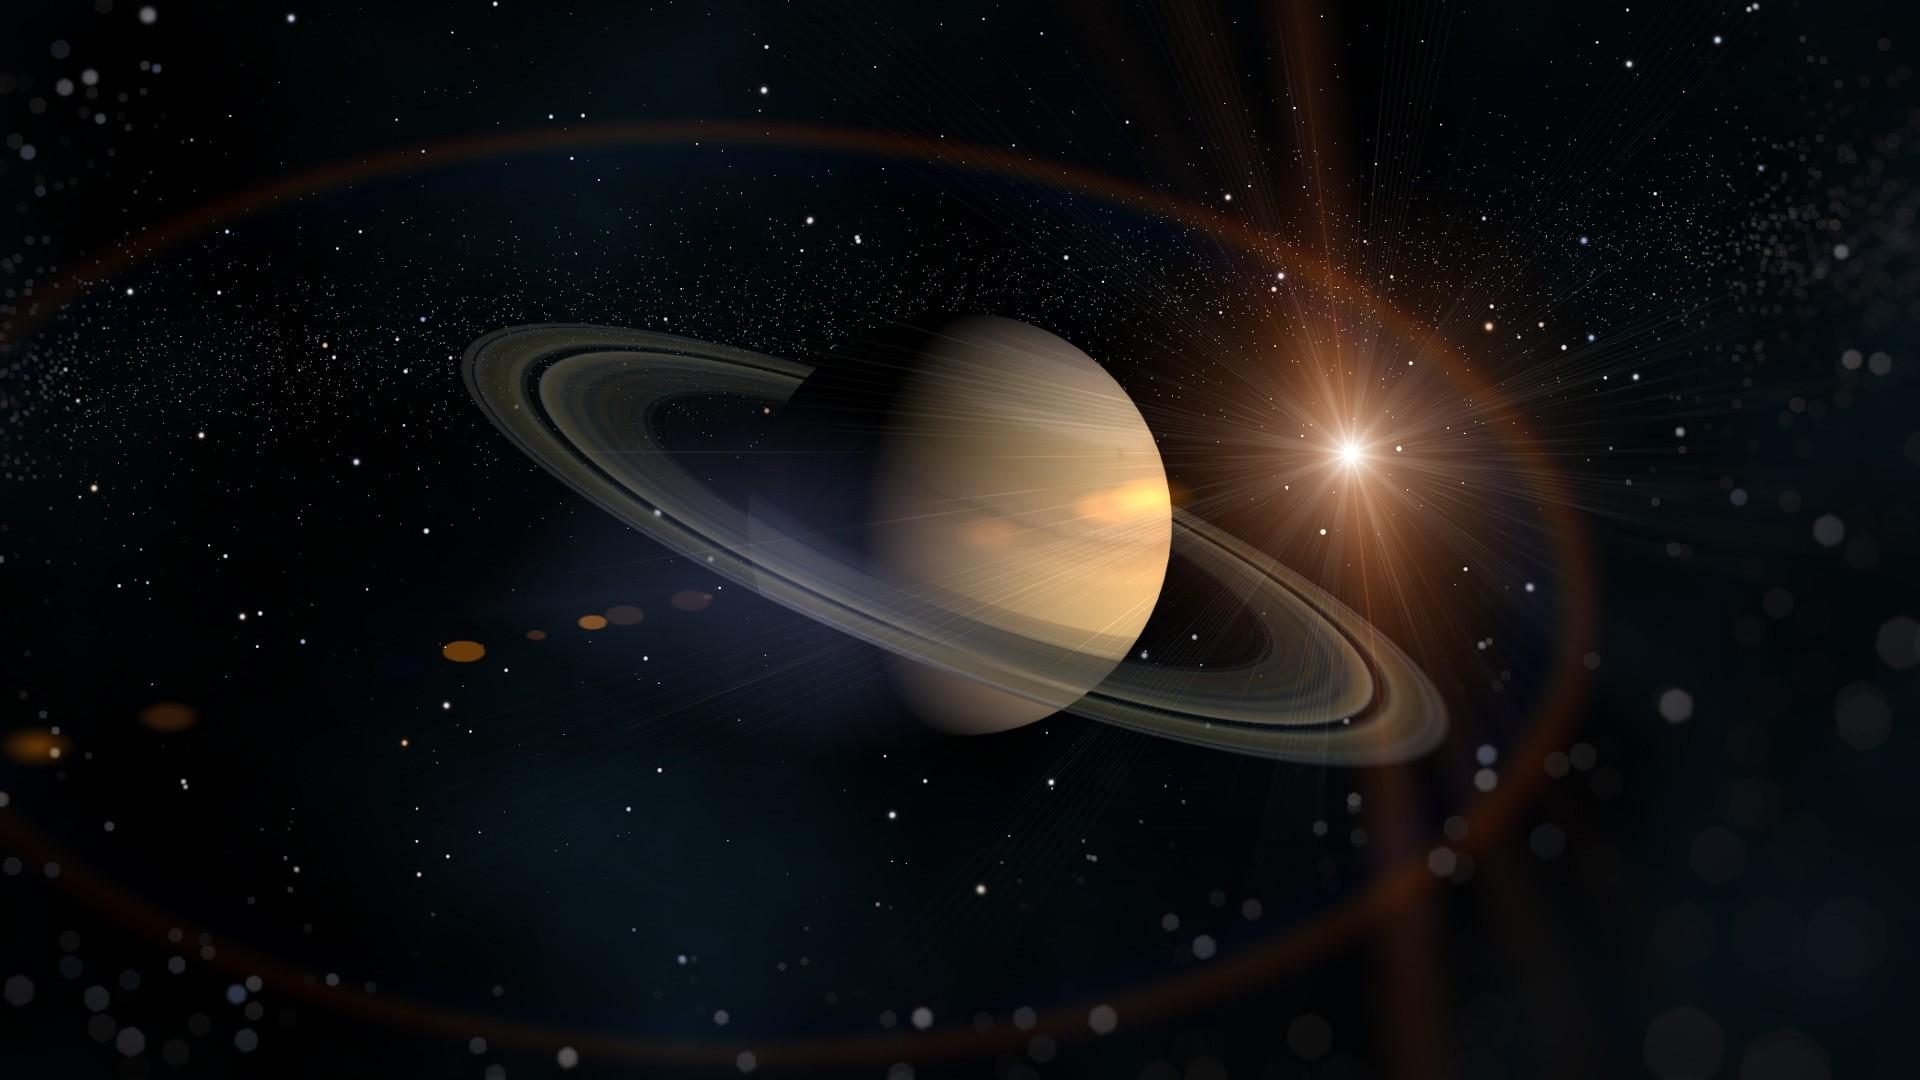 Saturn High Quality